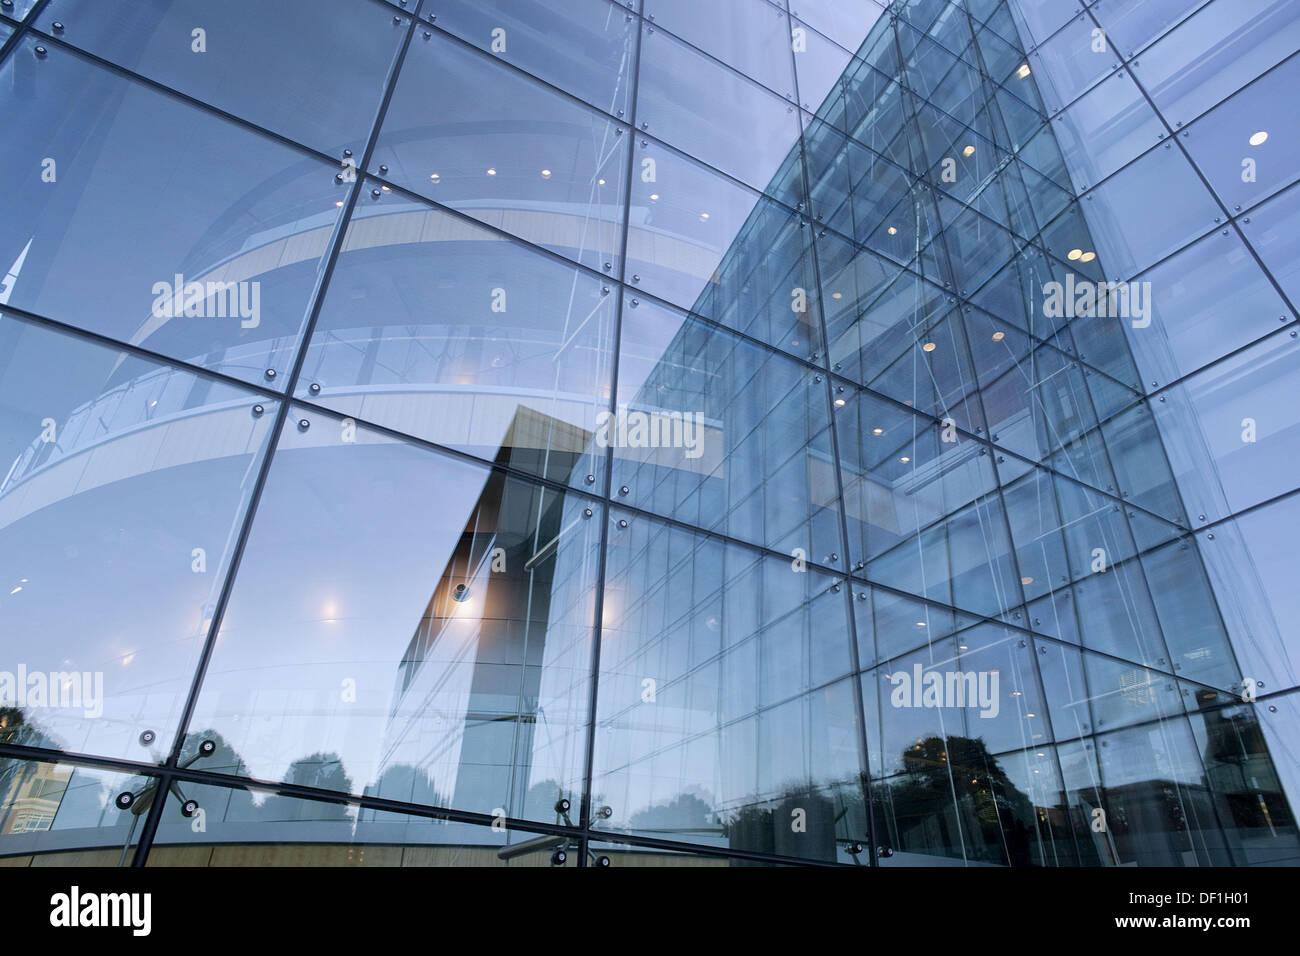 Harvard Medical School, Research Building, glass reflections, Avenue Louis Pasteur, Boston, Massachusetts, USA - Stock Image